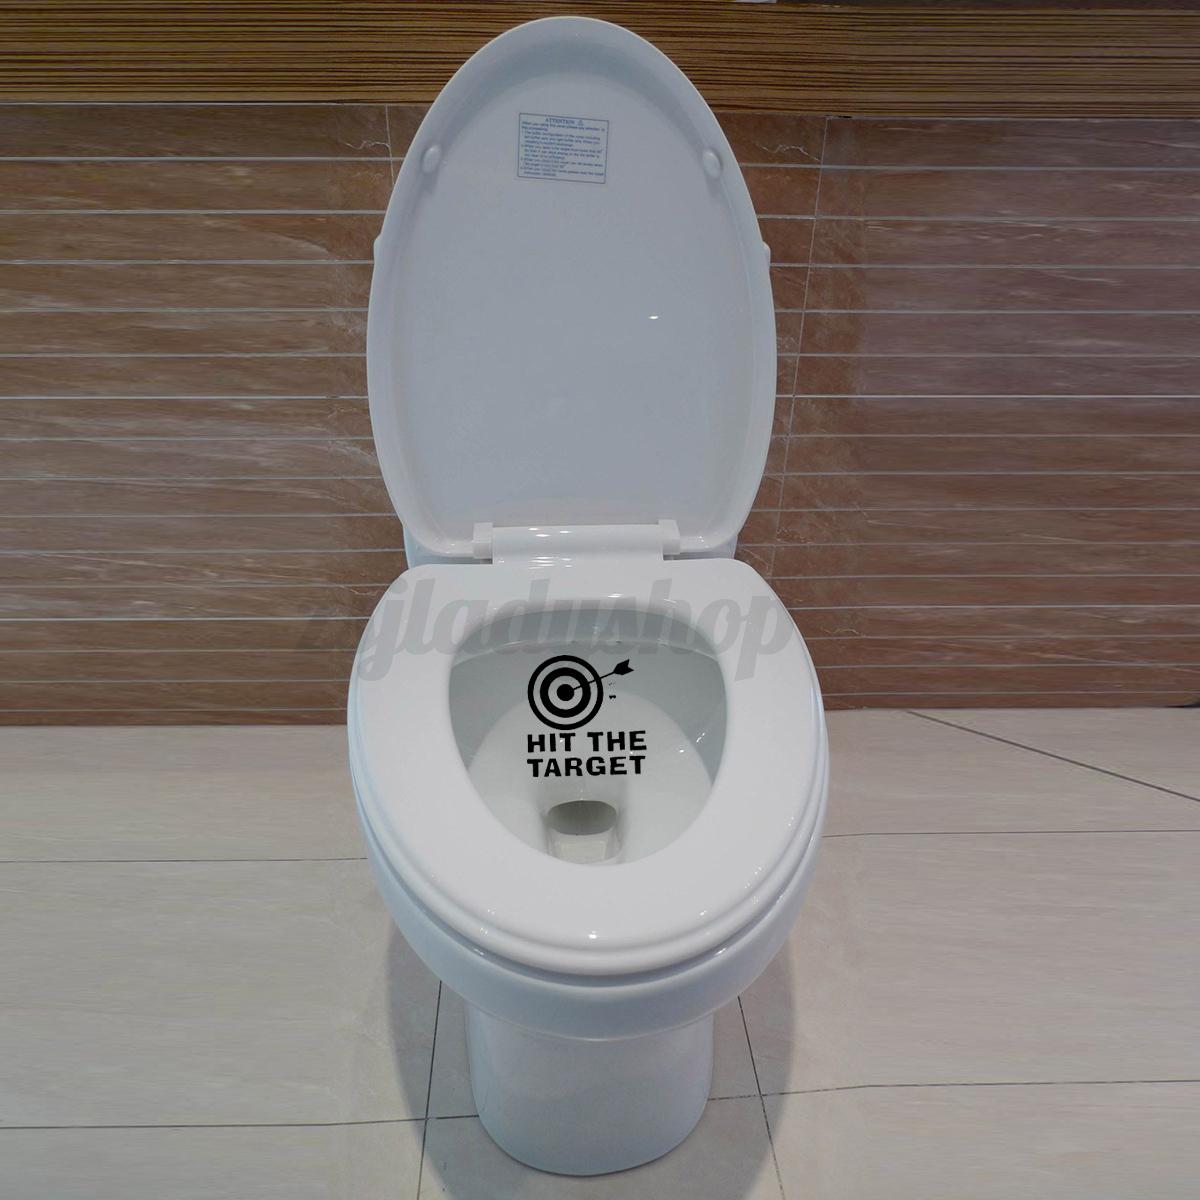 Diy Hit The Target Home Decor Bathroom Toilet Seat Wall Decal Sticker Waterproof Ebay